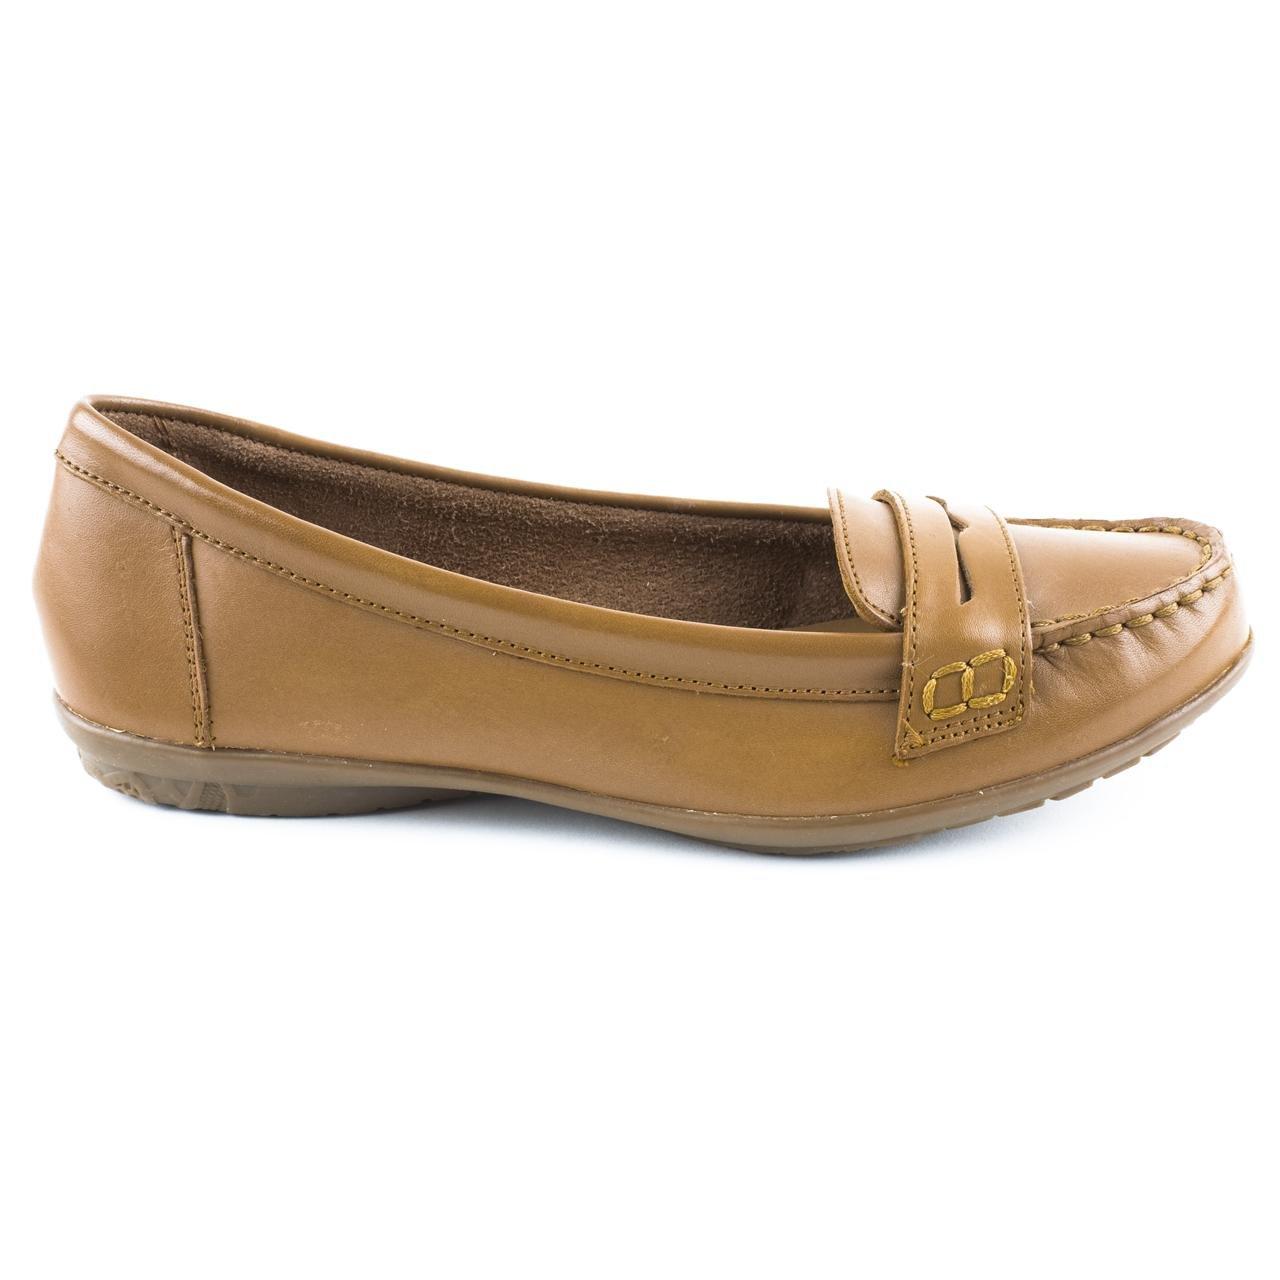 c16c8d18515 Ladies Hush Puppies Ceil Penny Brown - Beige Loafers Size 8  Amazon.co.uk   Shoes   Bags